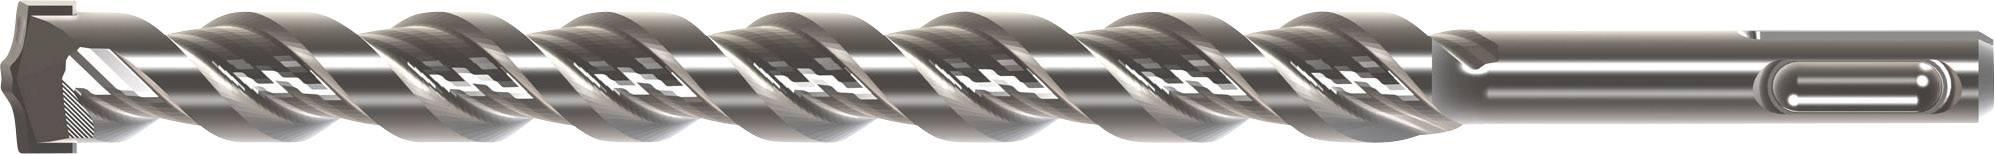 Tvrdý kov kladivový vrták Heller 156479, 20 mm, 200 mm, 1 ks